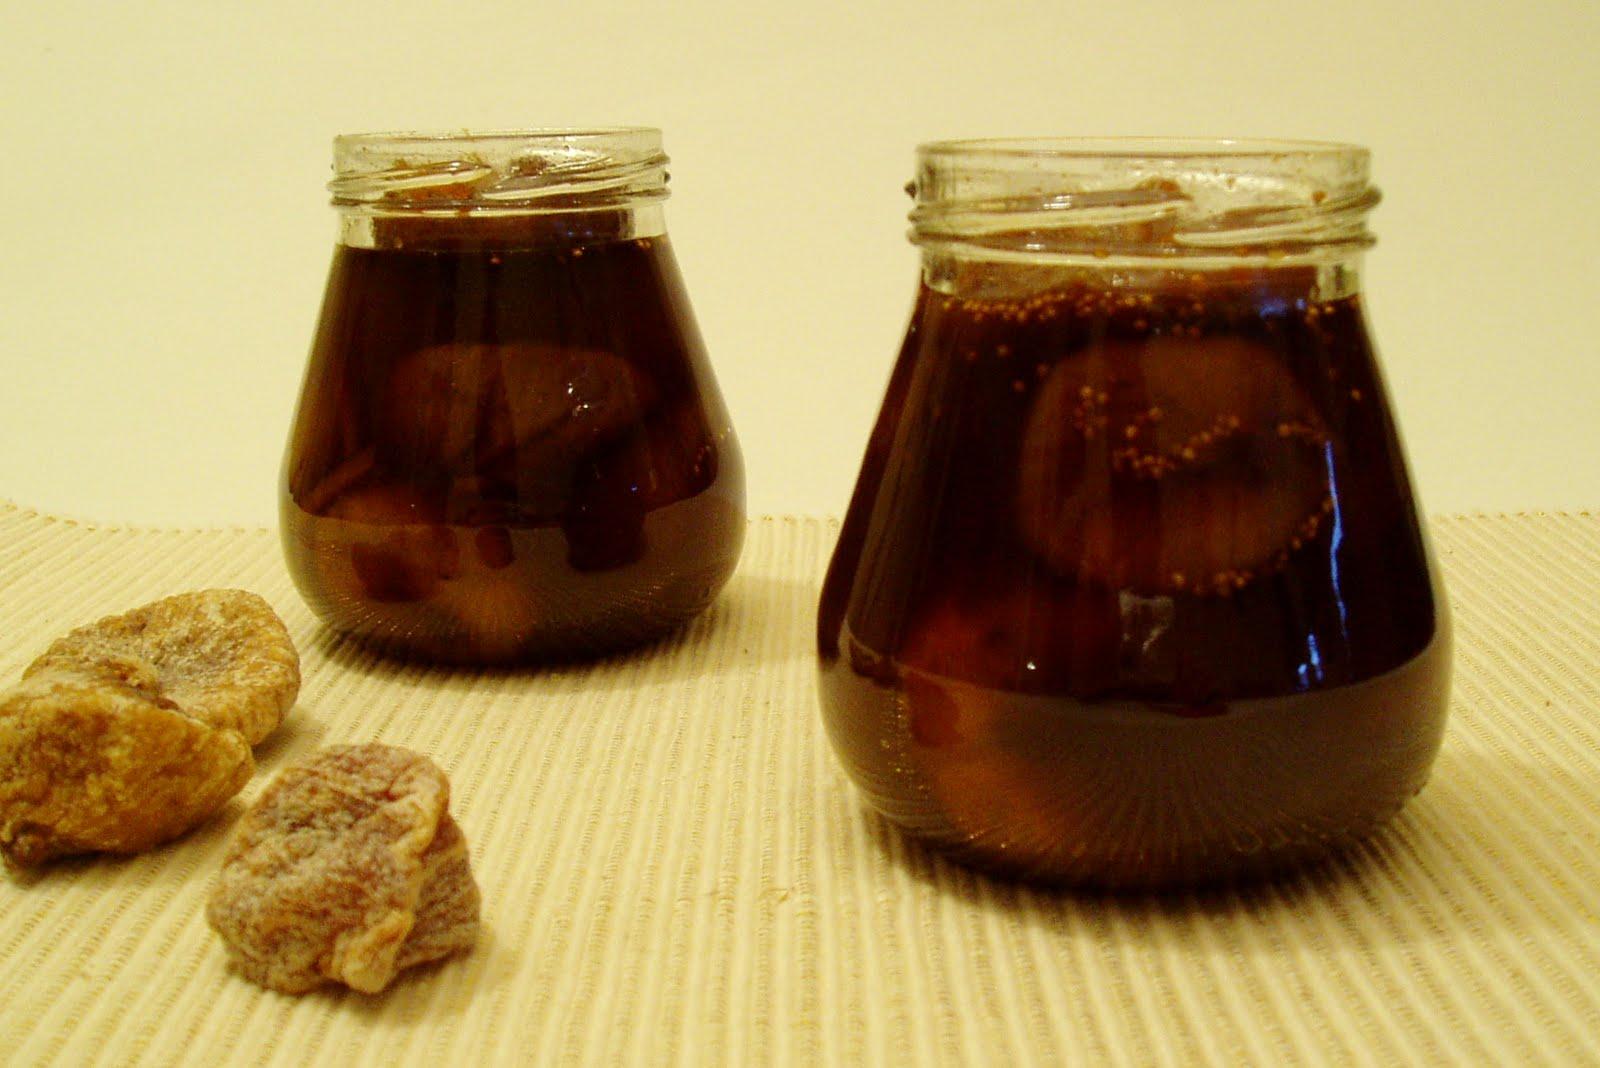 Prirodni sirup protiv kašlja! (Recept)